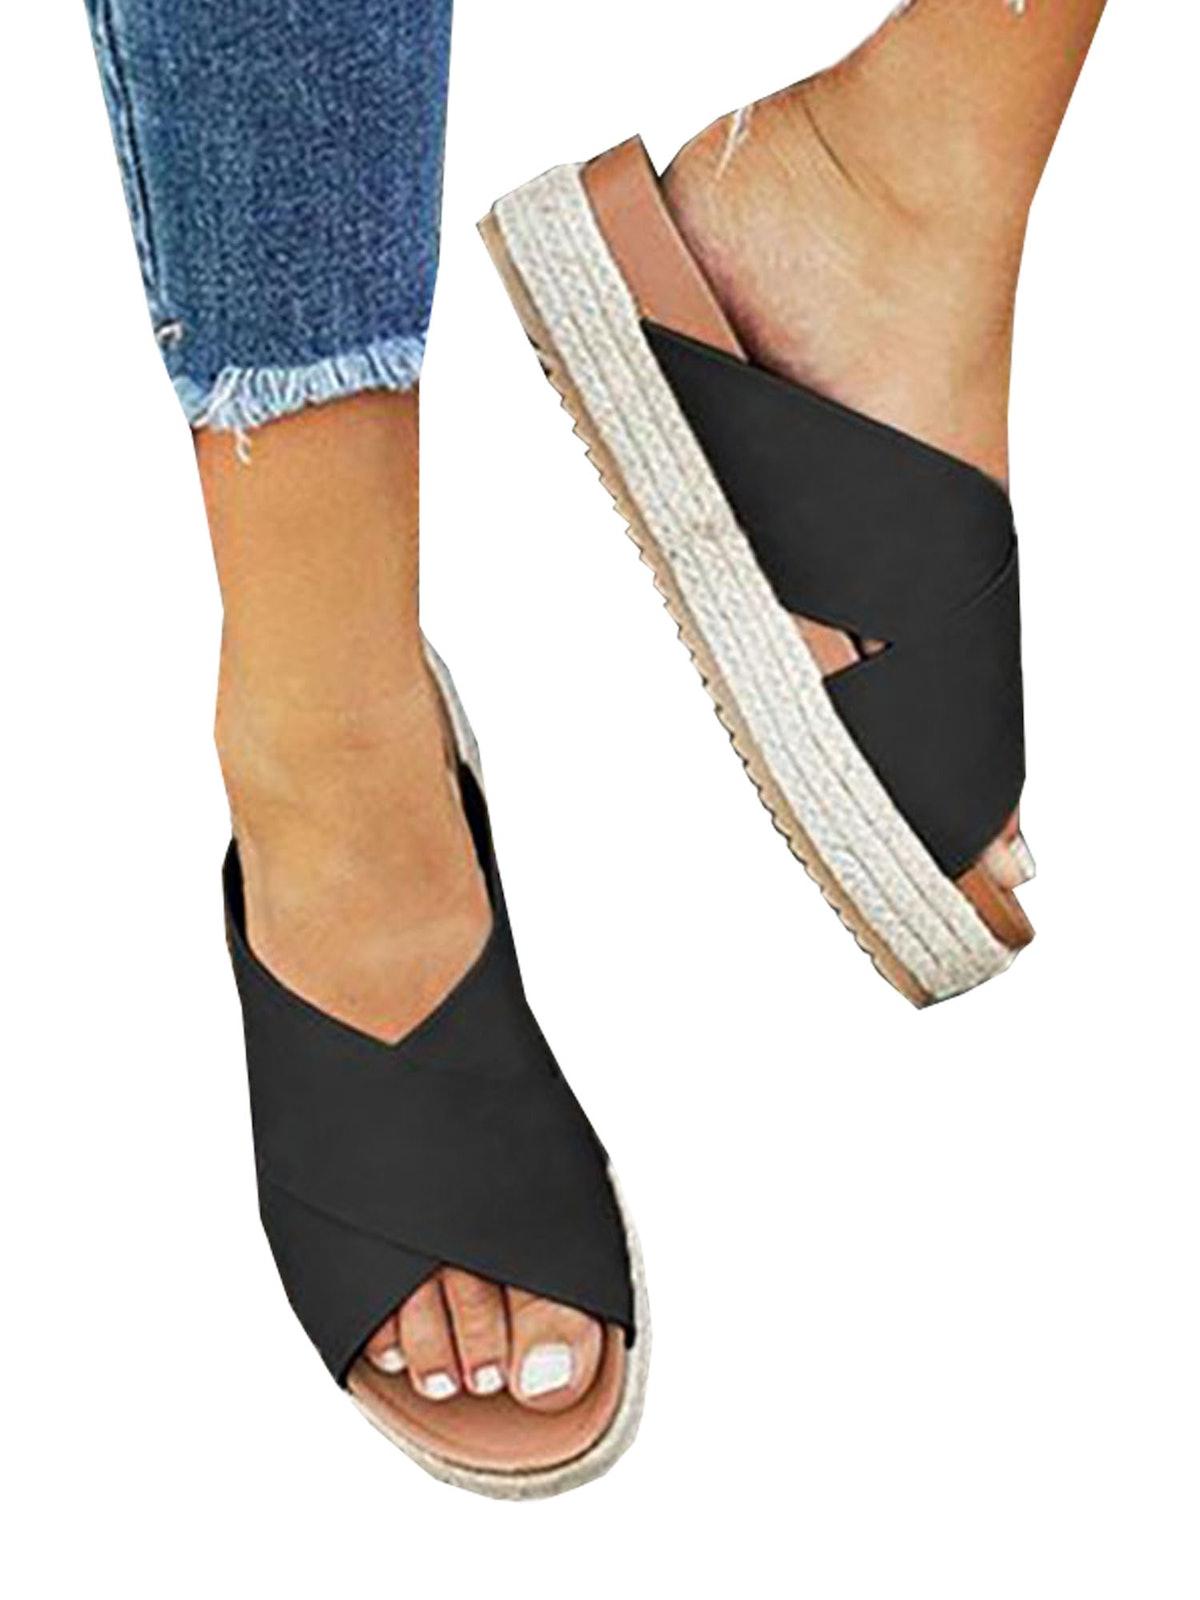 Womens Wedge Flatform Sandals Summer Open Toe Espadrilles Beach Shoes Slippers